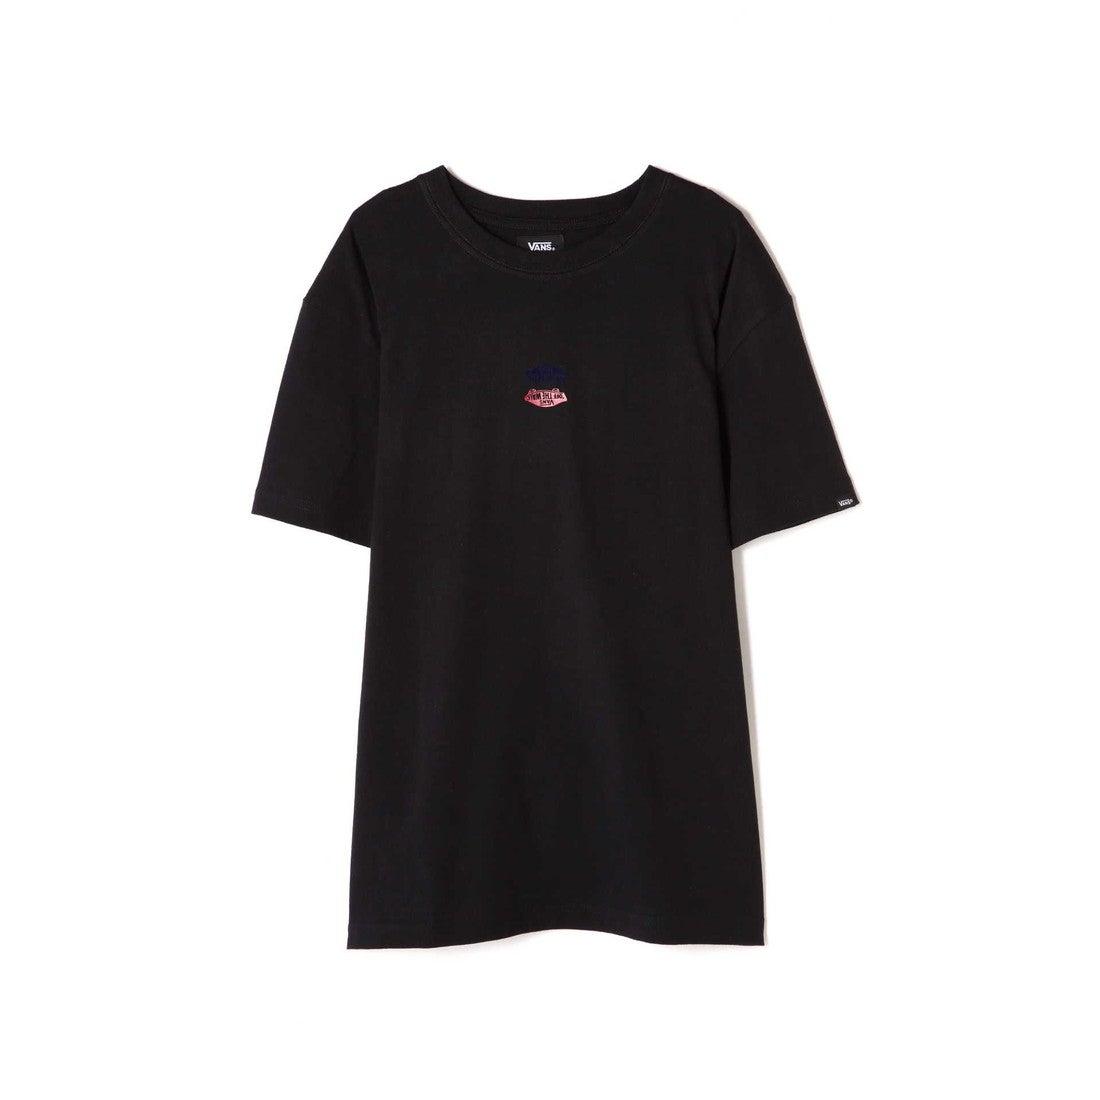 VANSOTWReversalTシャツブラック